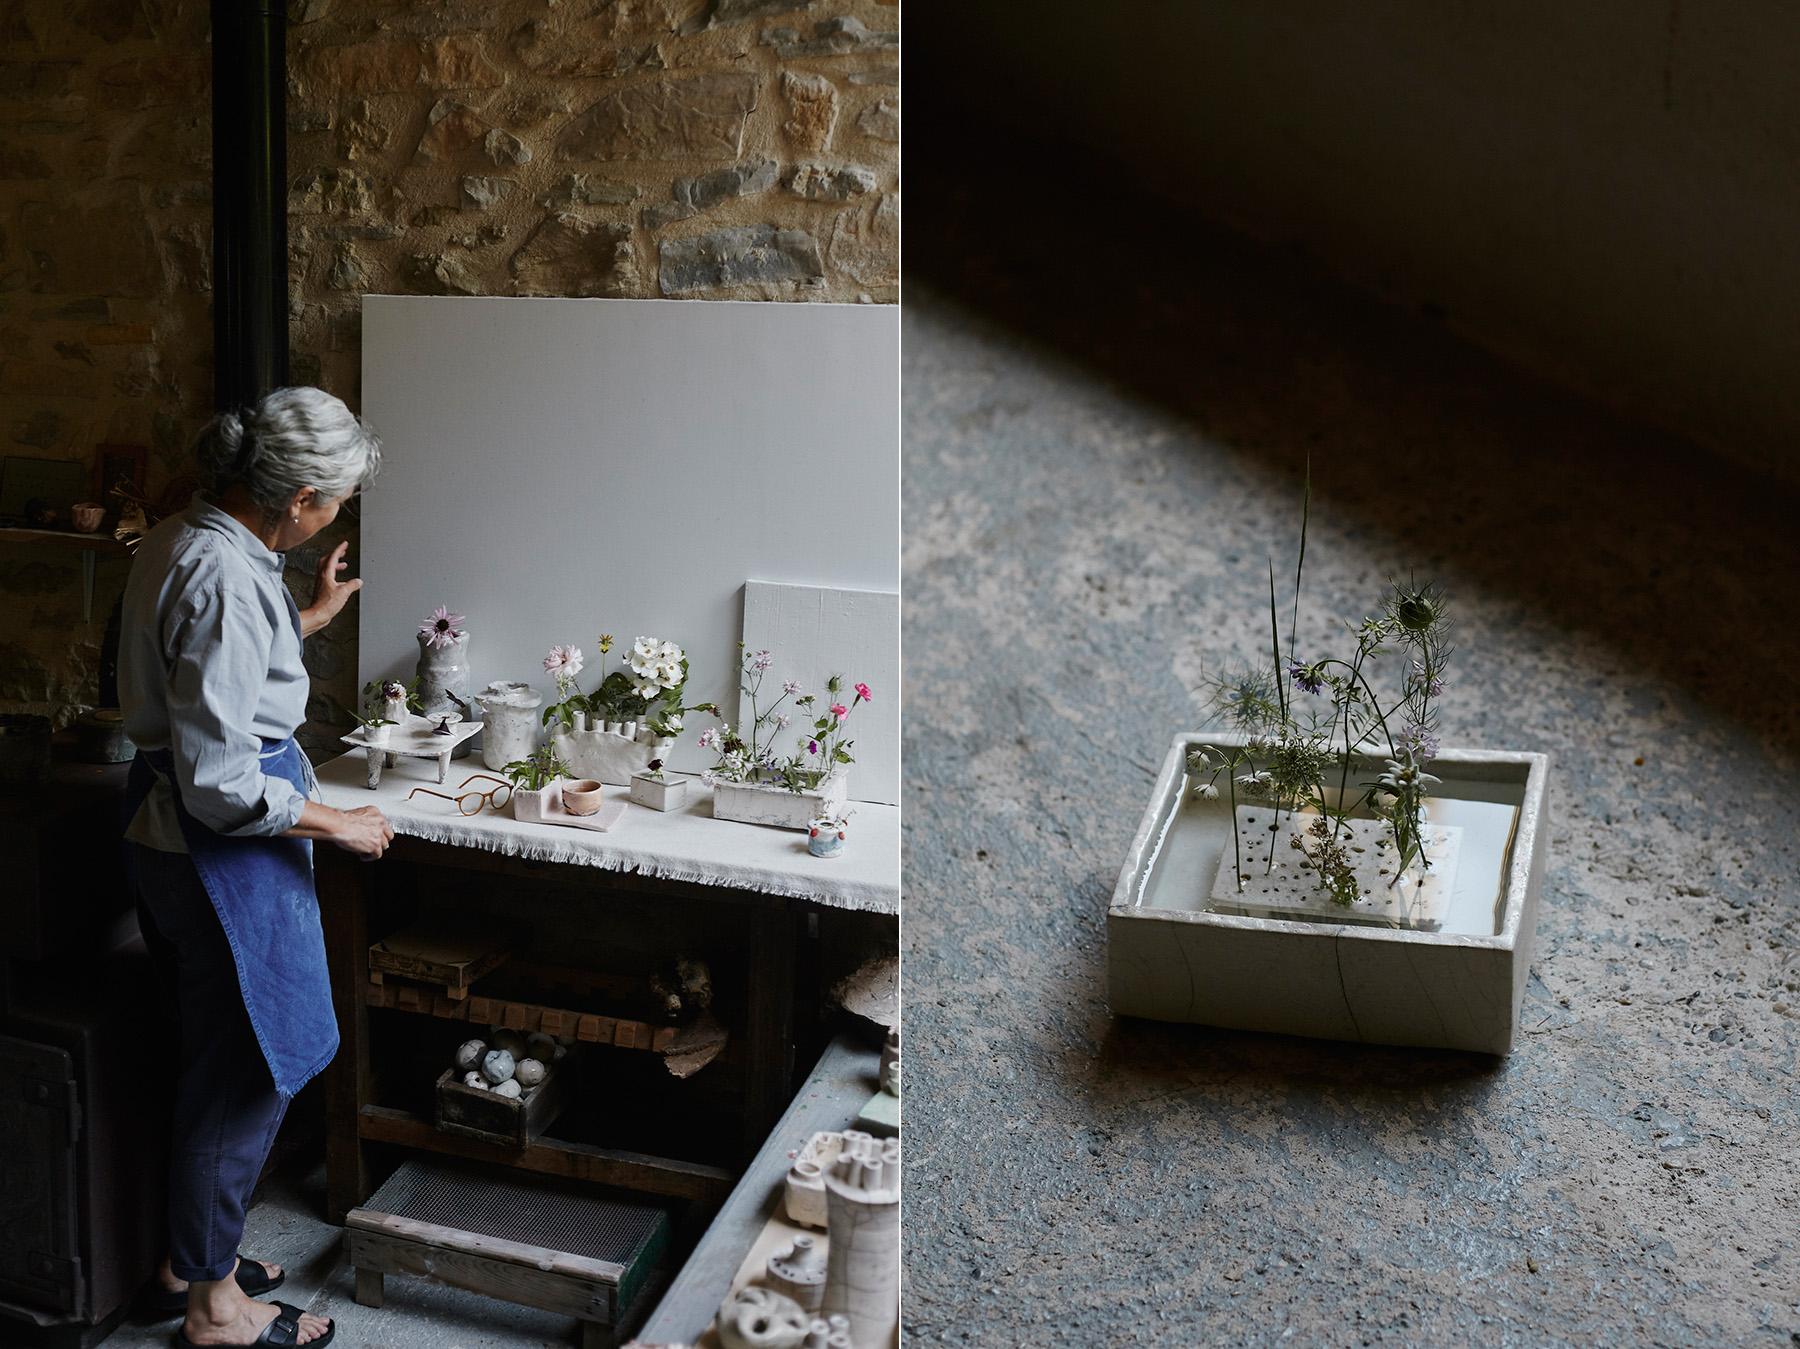 LEFT: Cécile arranges flowers from the garden in her vases. RIGHT:  Pique-Fleurs en bassin .